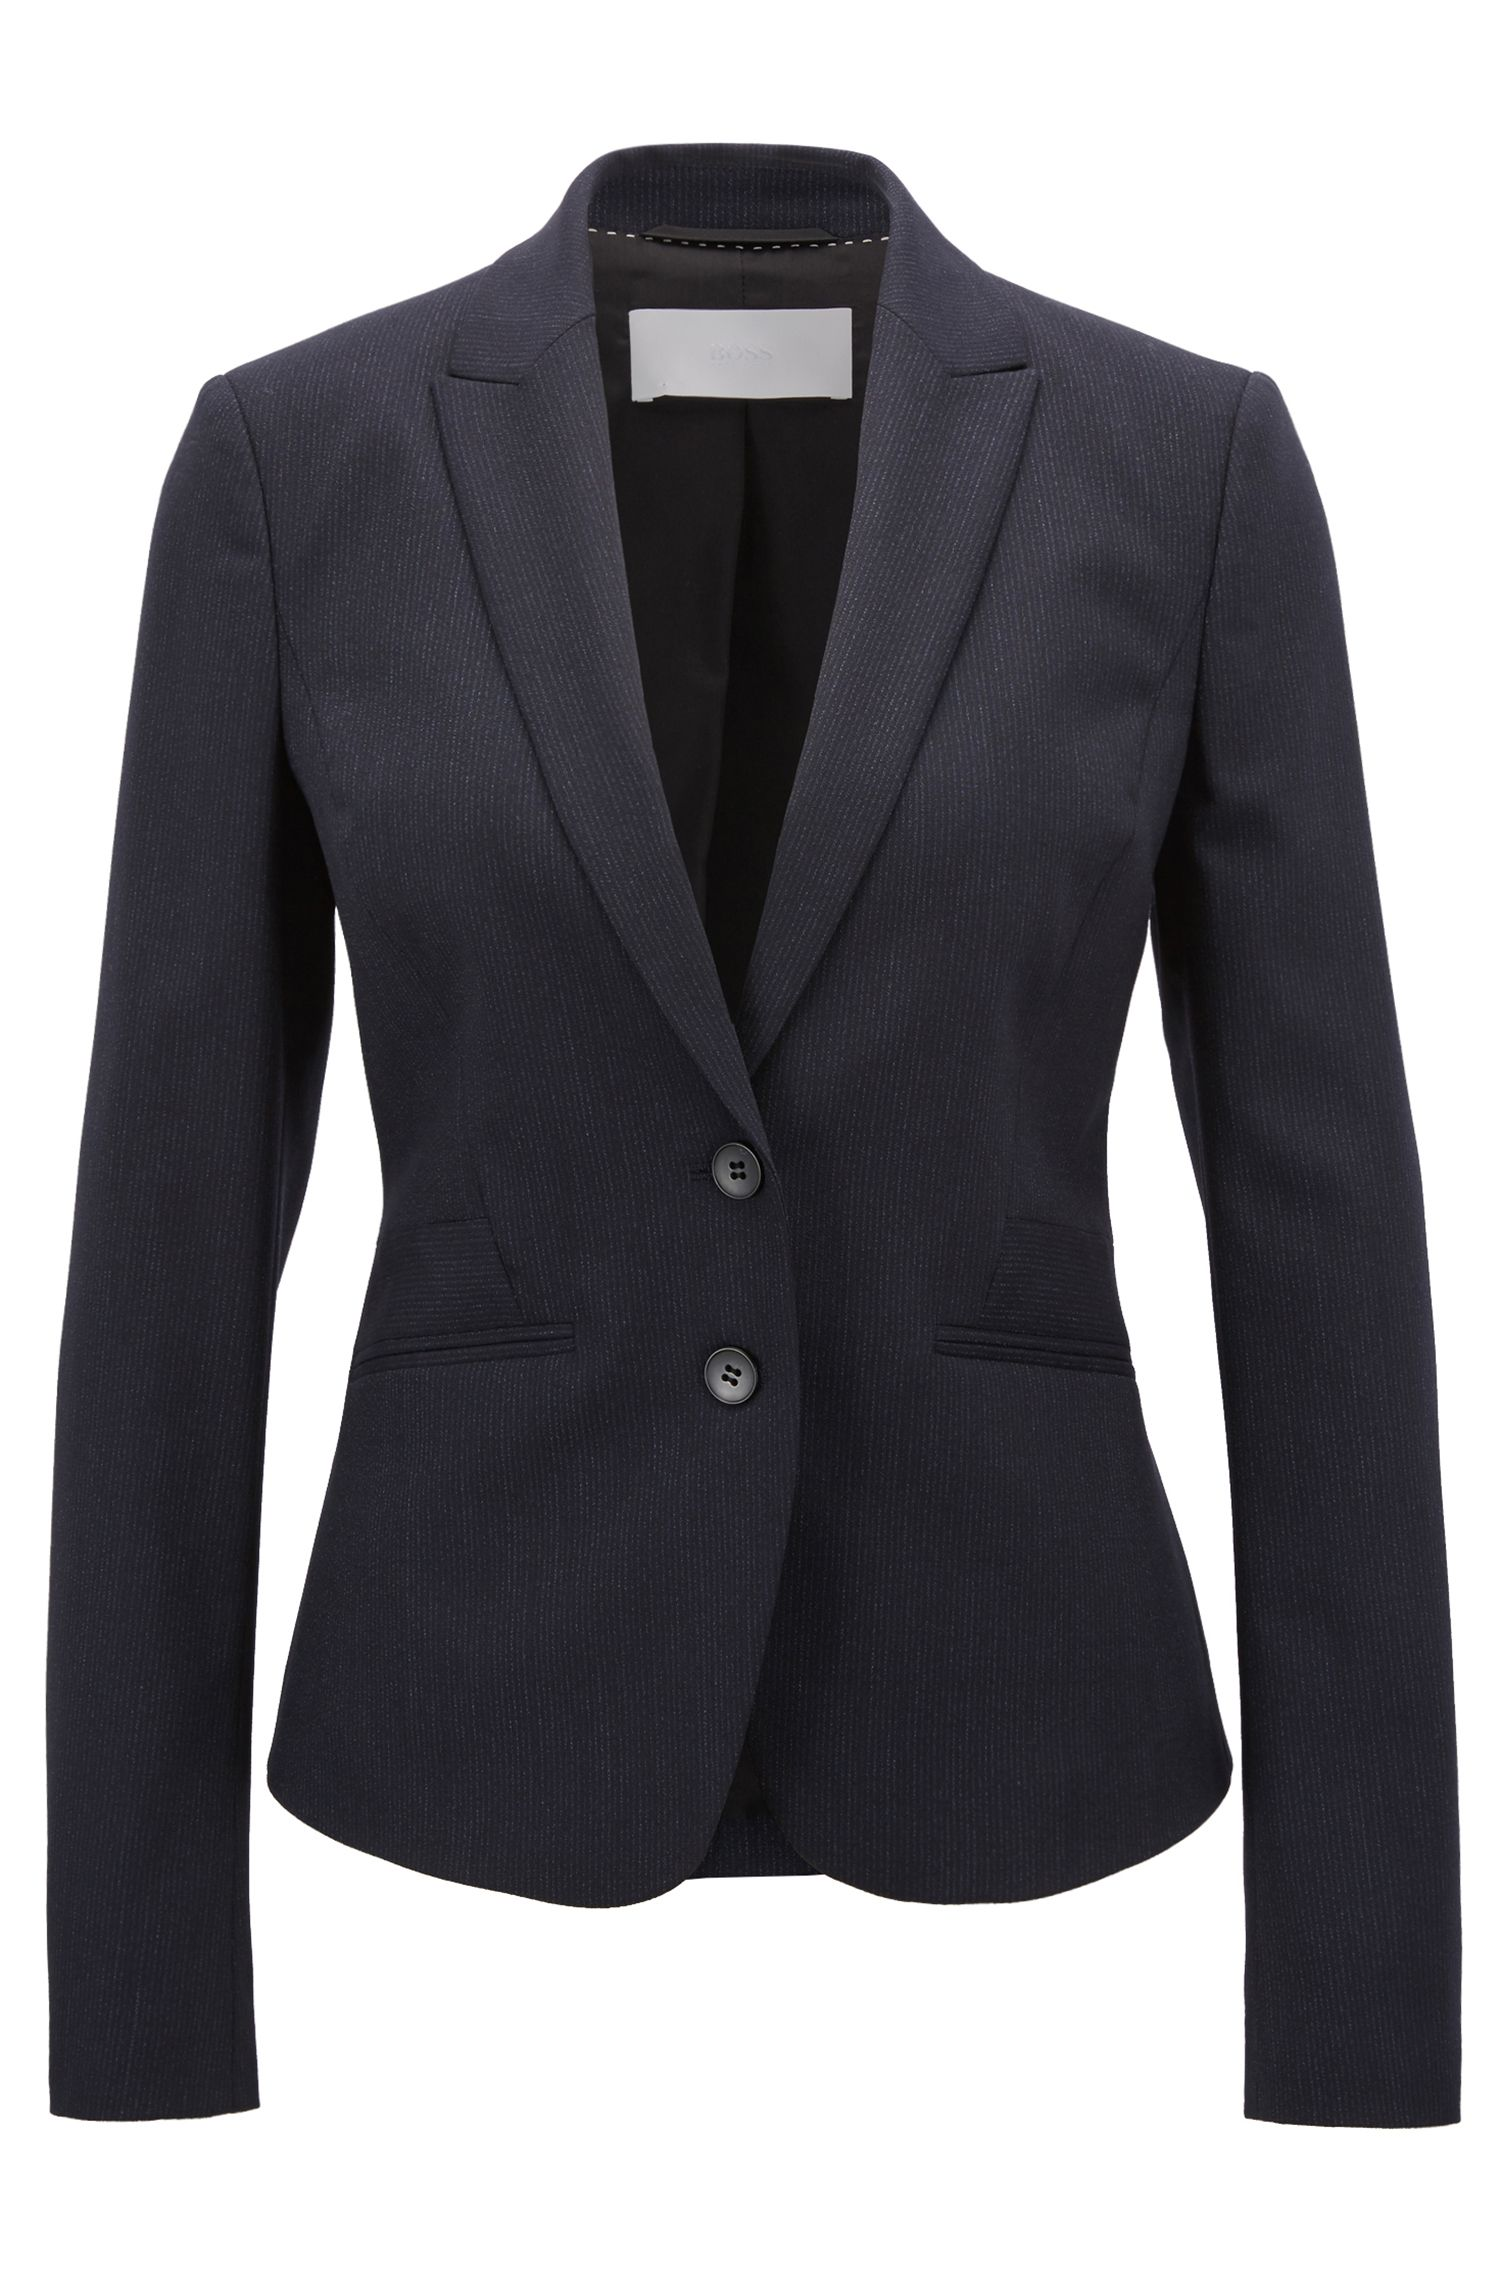 Regular-fit blazer in stretch virgin wool, Patterned